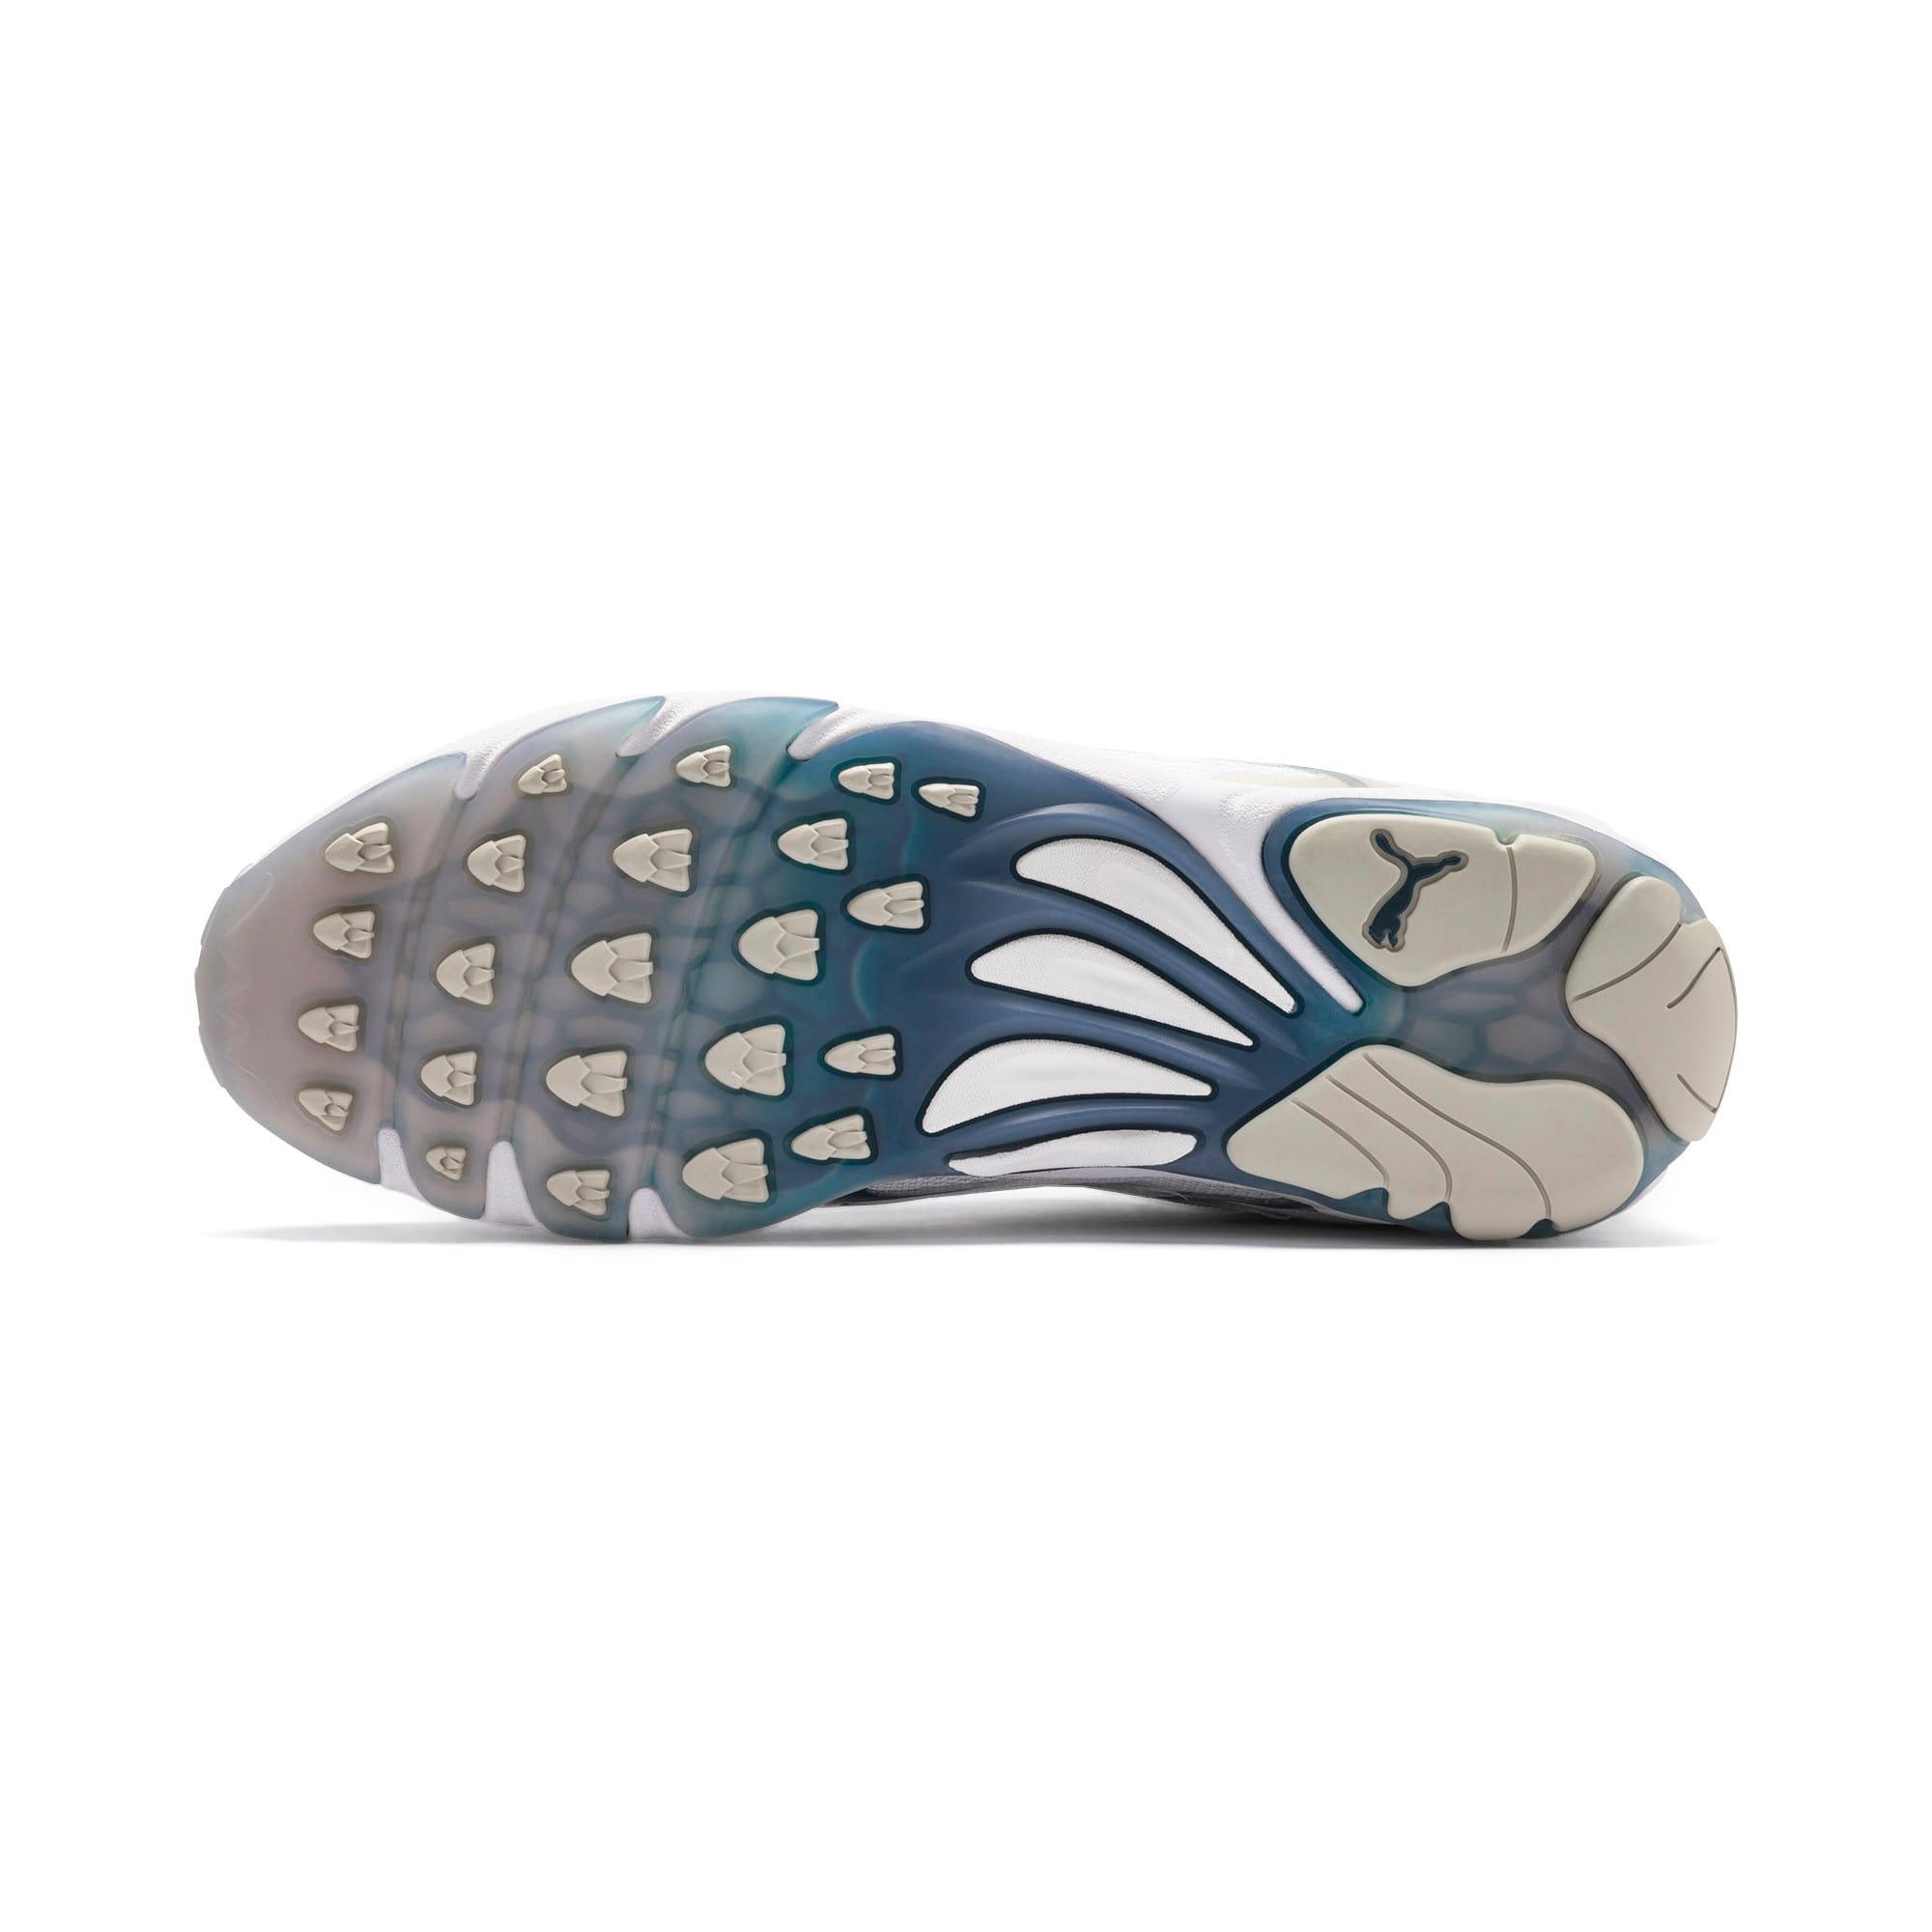 Thumbnail 5 of Inhale Sneakers, Puma White-Gray Violet, medium